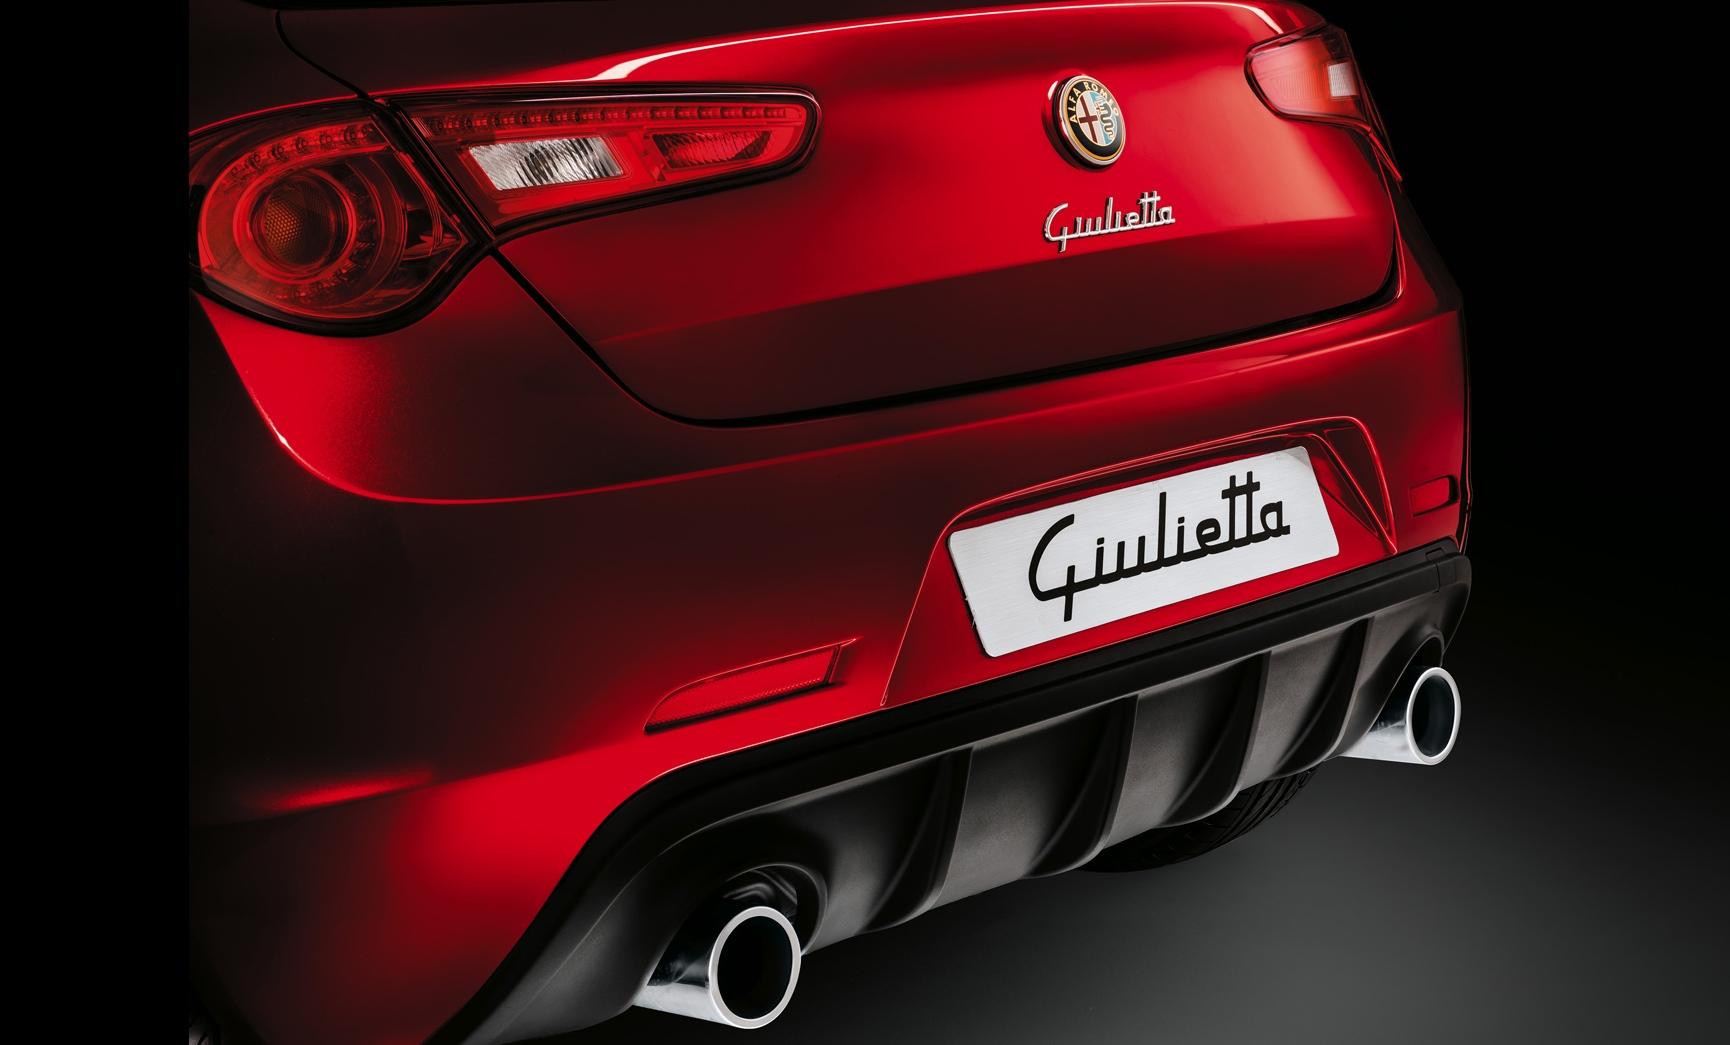 alfa romeo giulietta wallpaper red